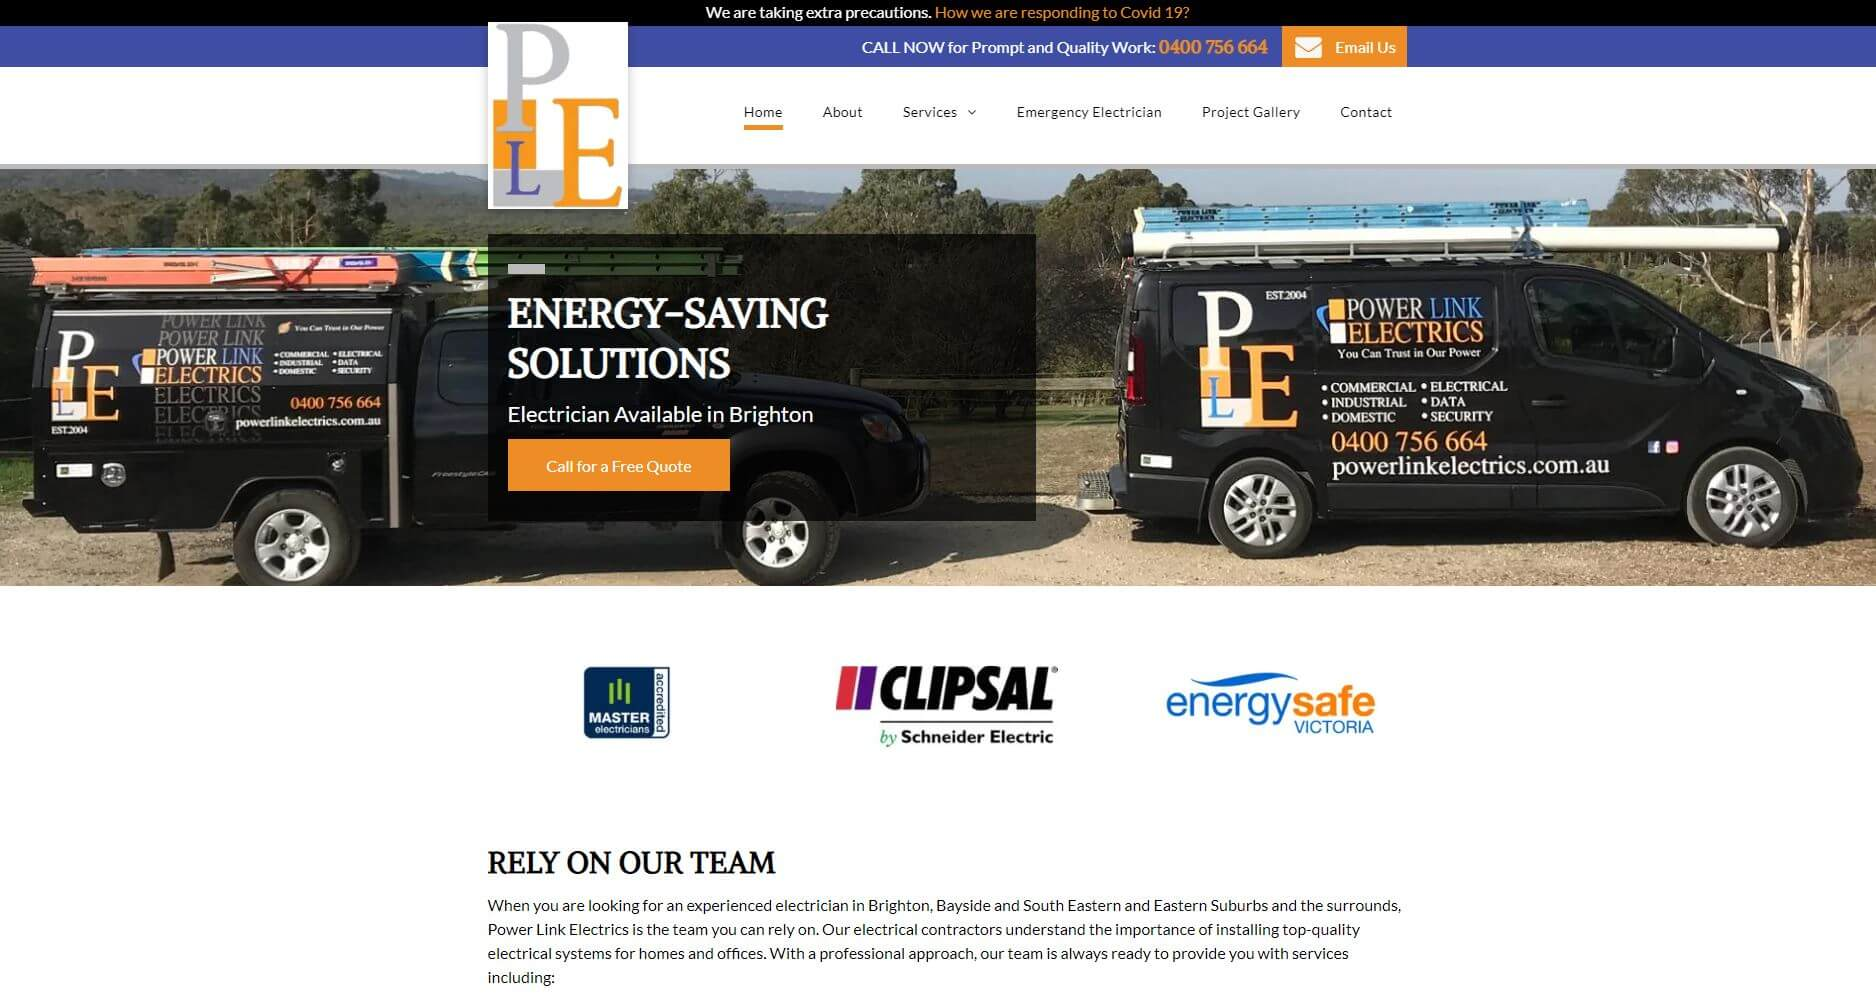 Power Link Electrics